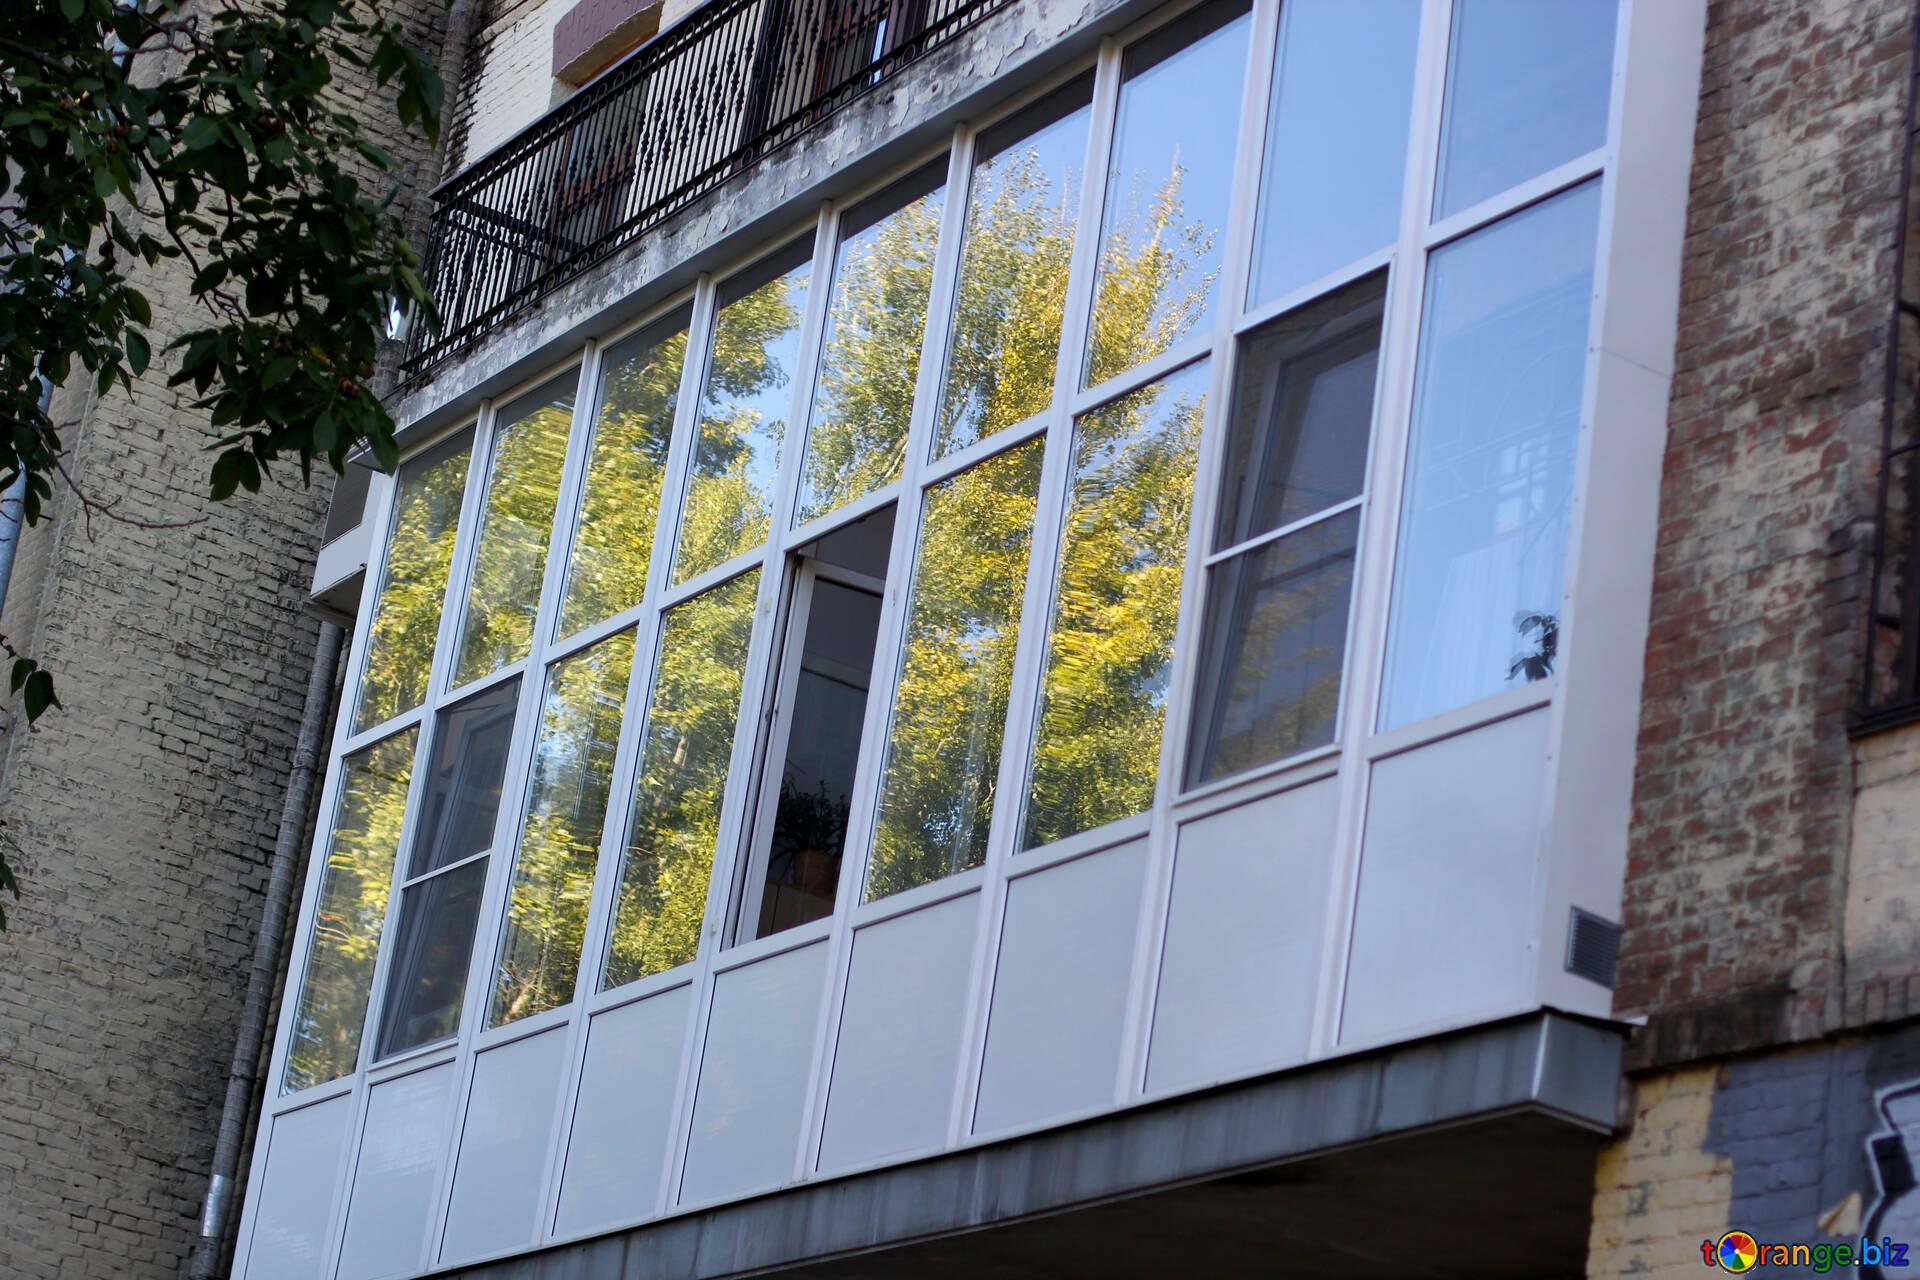 Balkon Kunststoff | Kunststofffenster Alte Verglasten Balkon Kunststoff Glas 41681